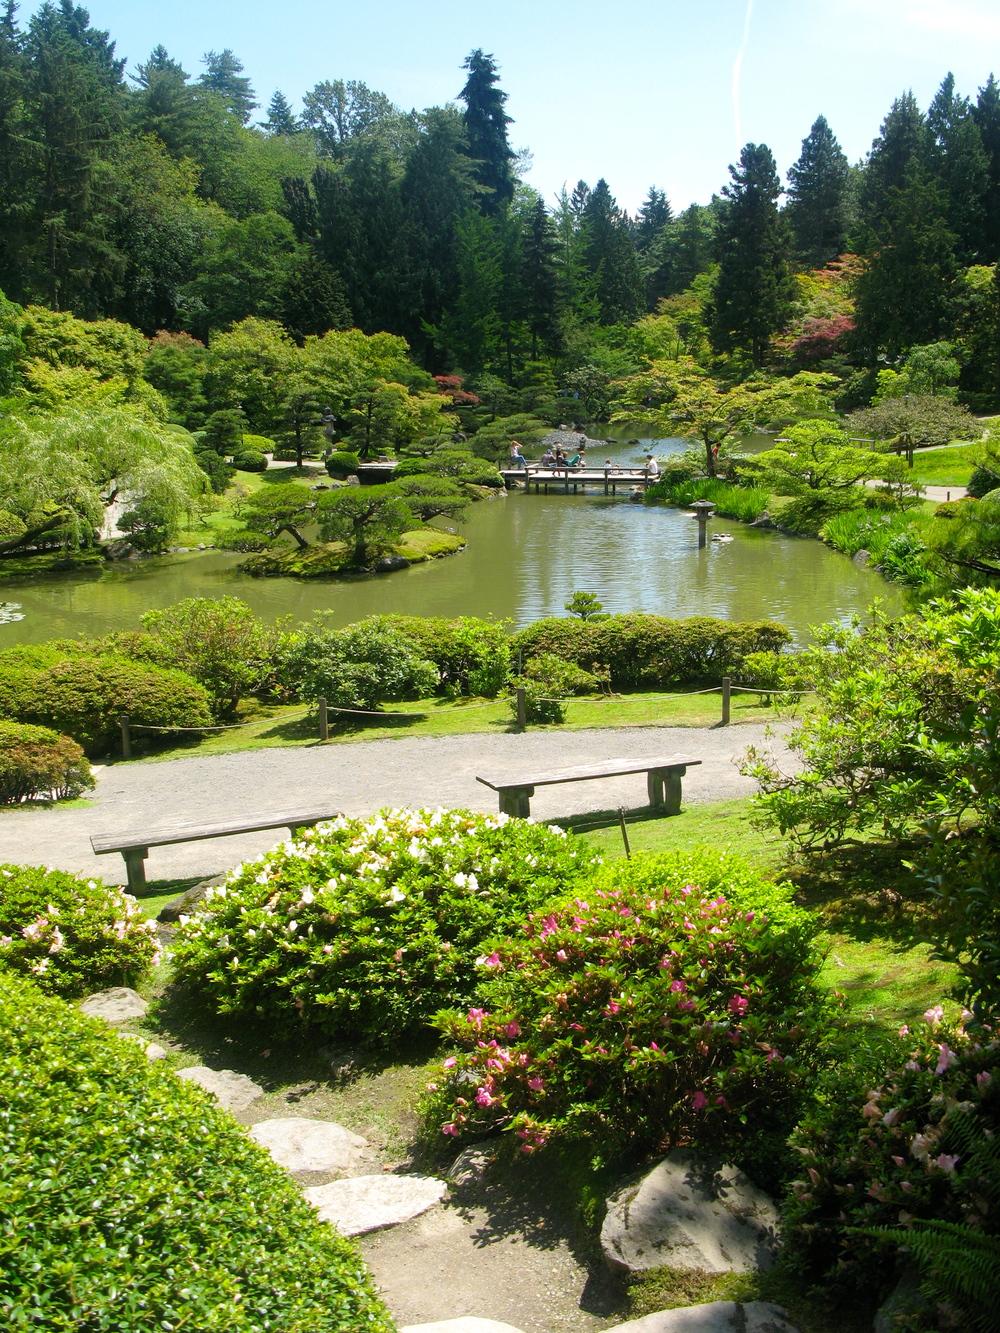 Japanese Gardens near Seattle's Arboretum. Photo by Rebecca Garland.